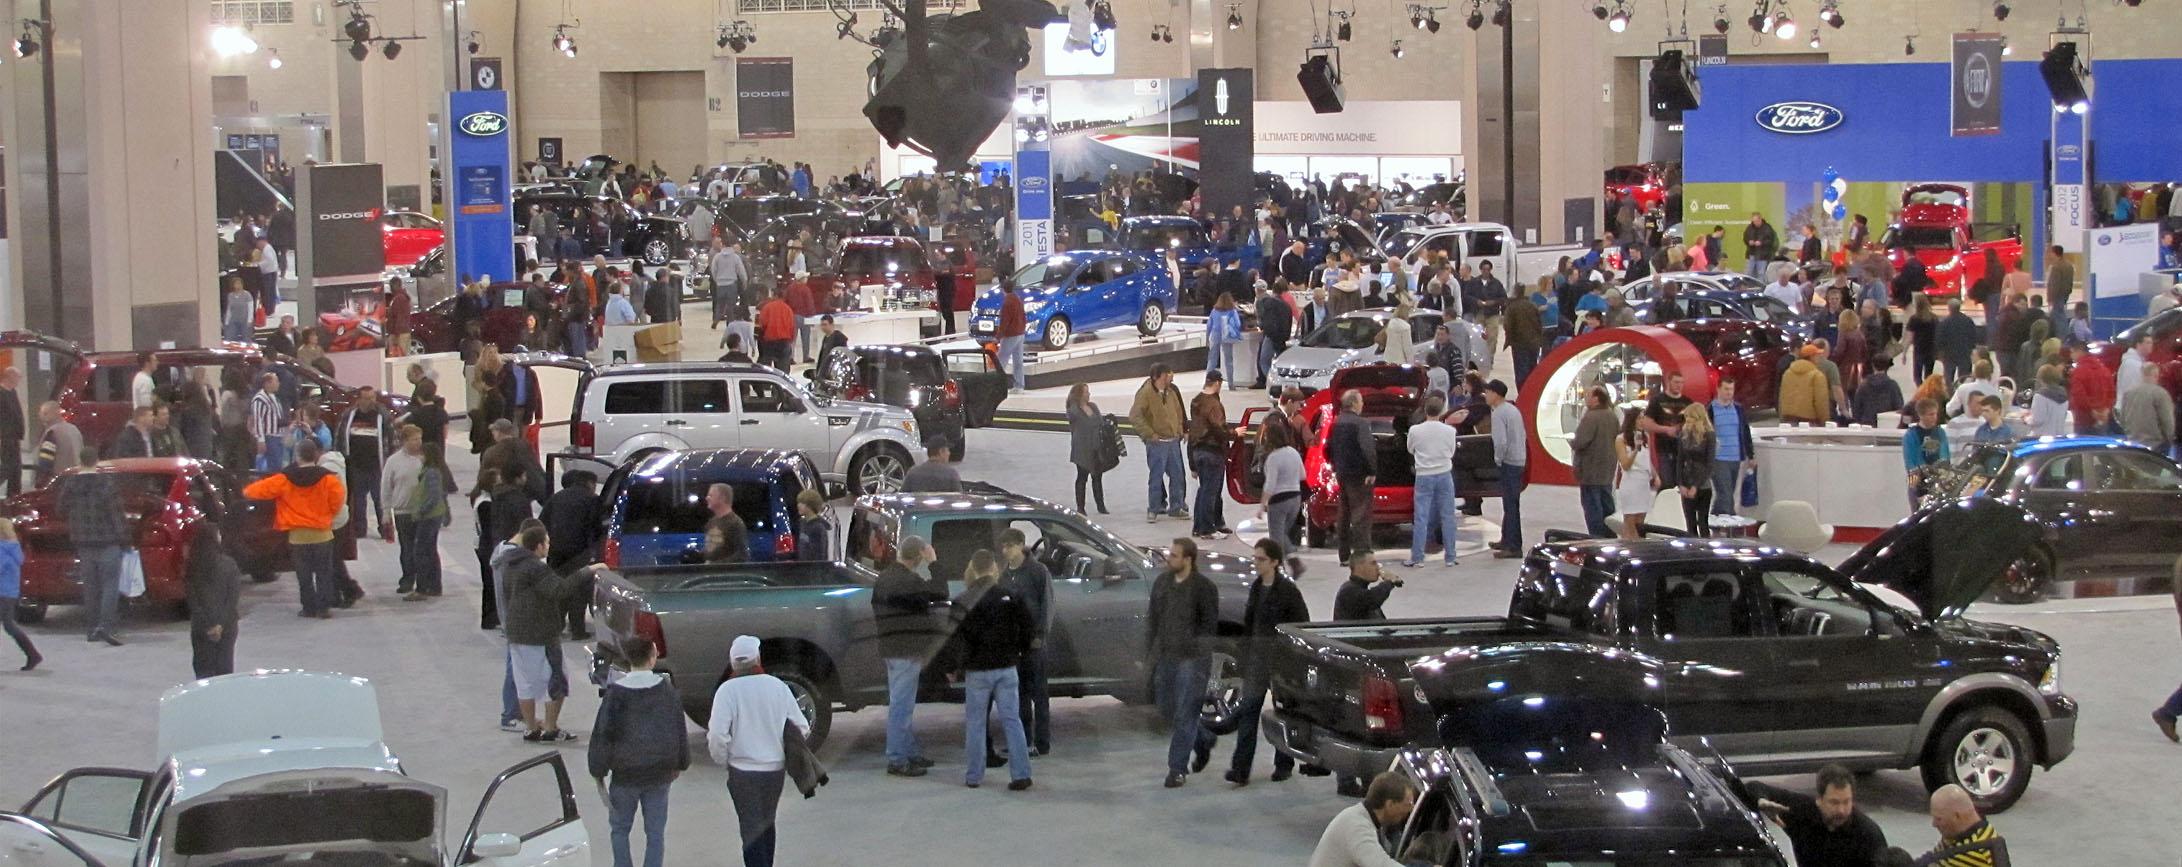 Motorheads Unite Motorsports Show Philadelphia Auto Show - When is the philadelphia car show